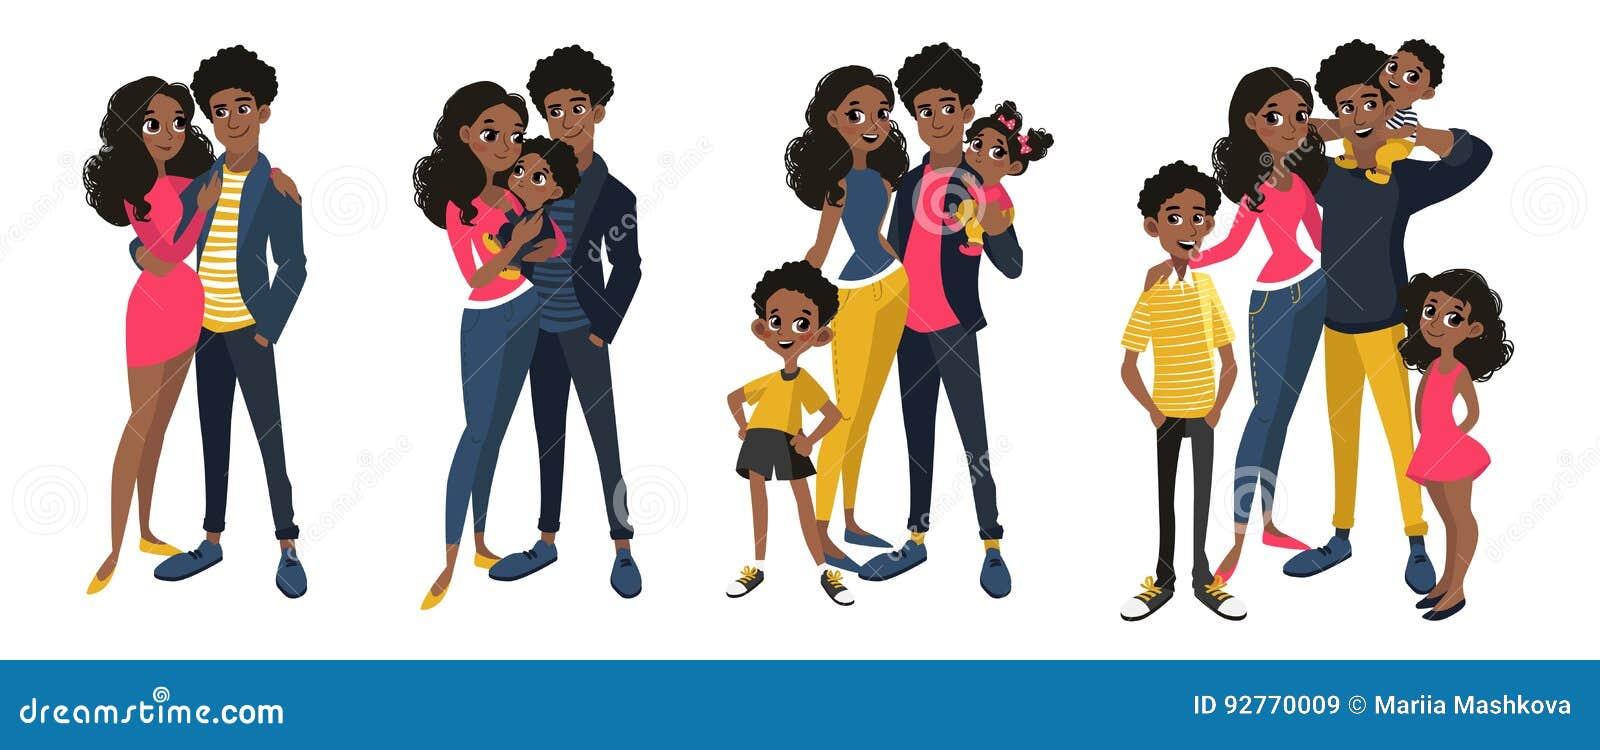 mom-dad-kids partnersuche